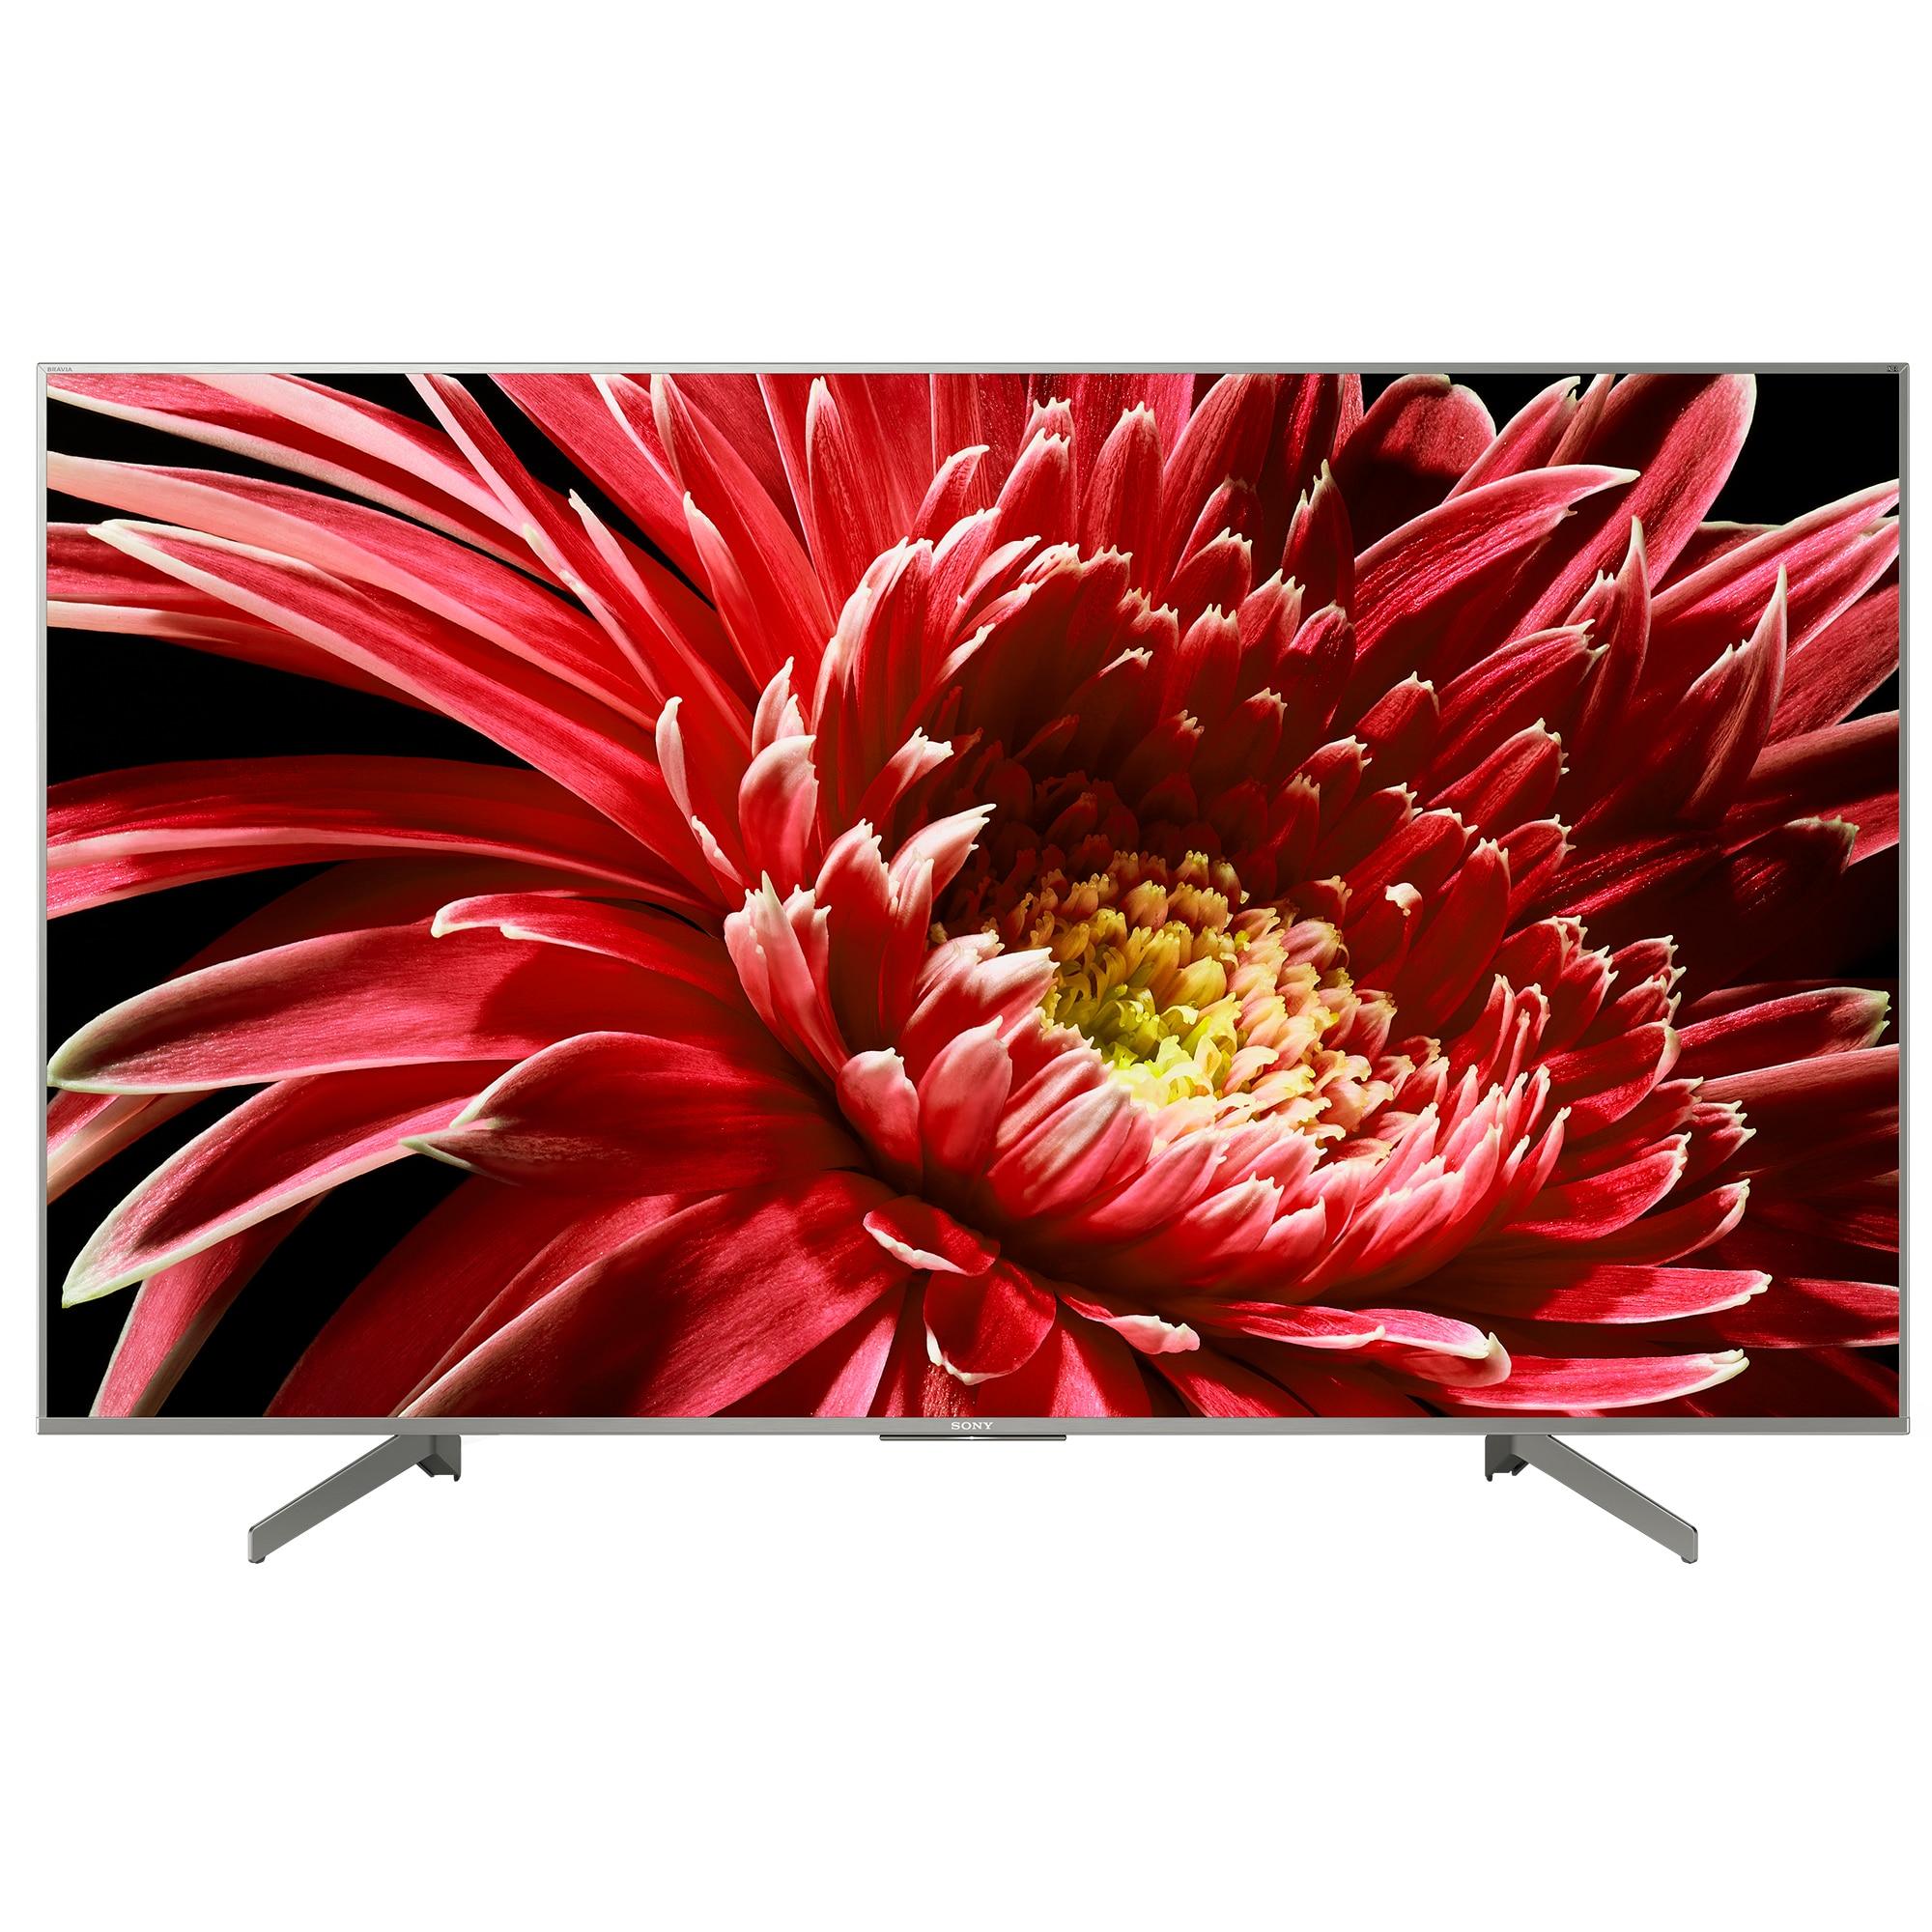 Fotografie Televizor Smart Android LED Sony BRAVIA, 138.8 cm, 55XG8577, 4K Ultra HD